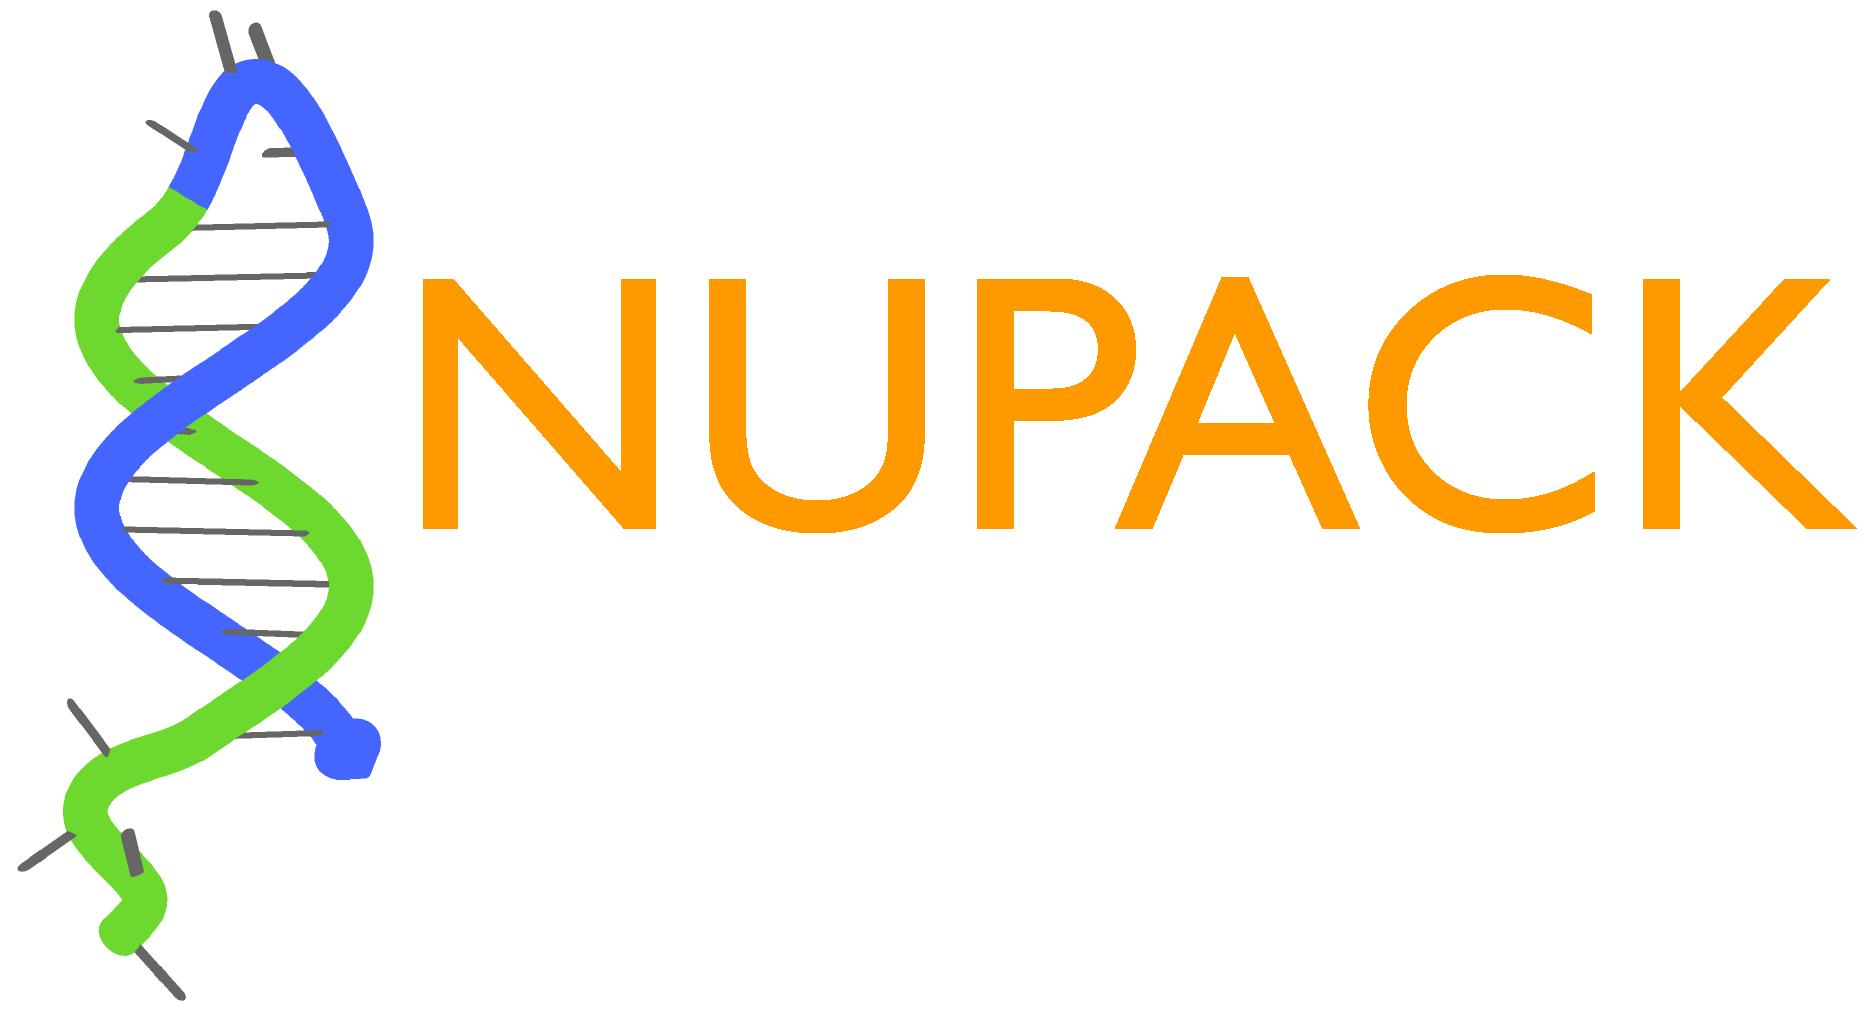 NUPACK logo